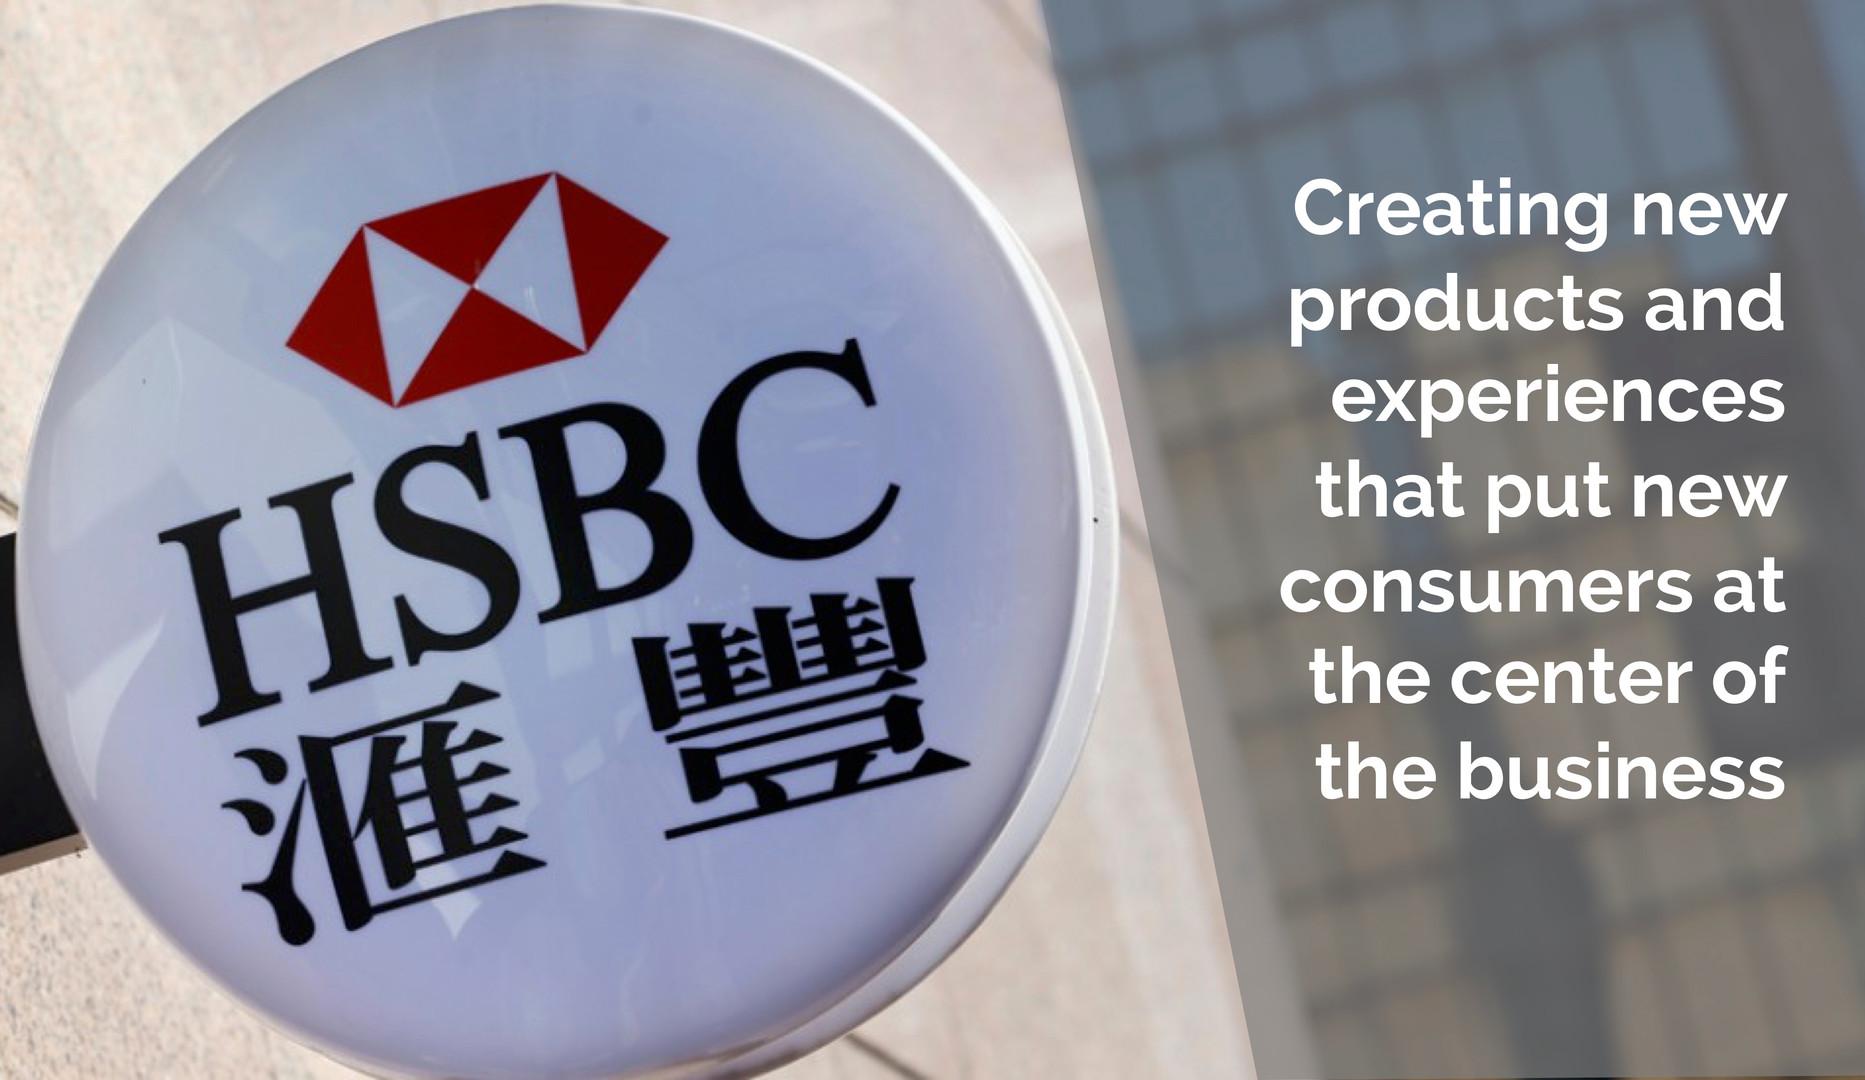 HSBC_Case.jpg